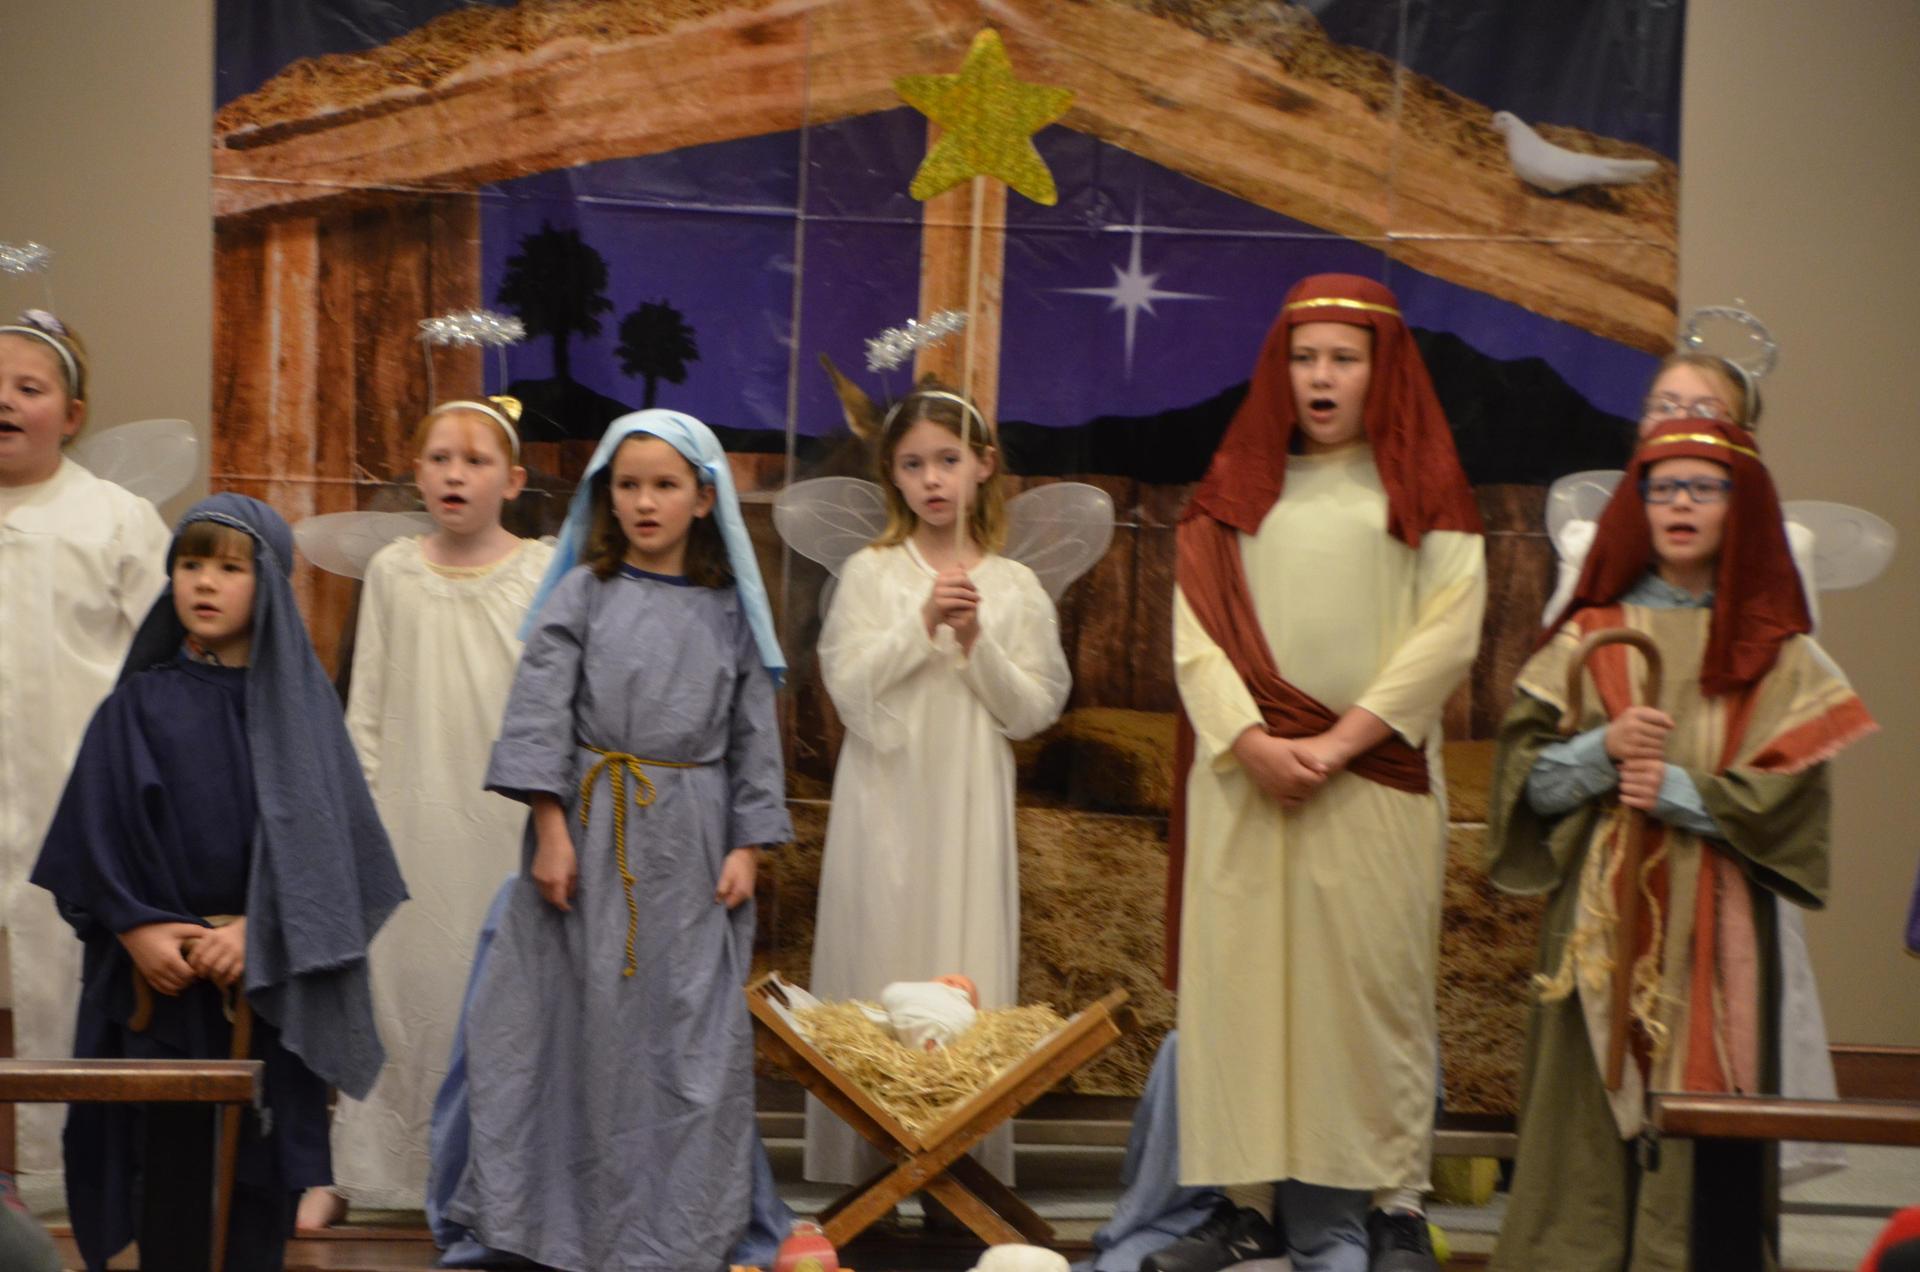 children's nativity scene